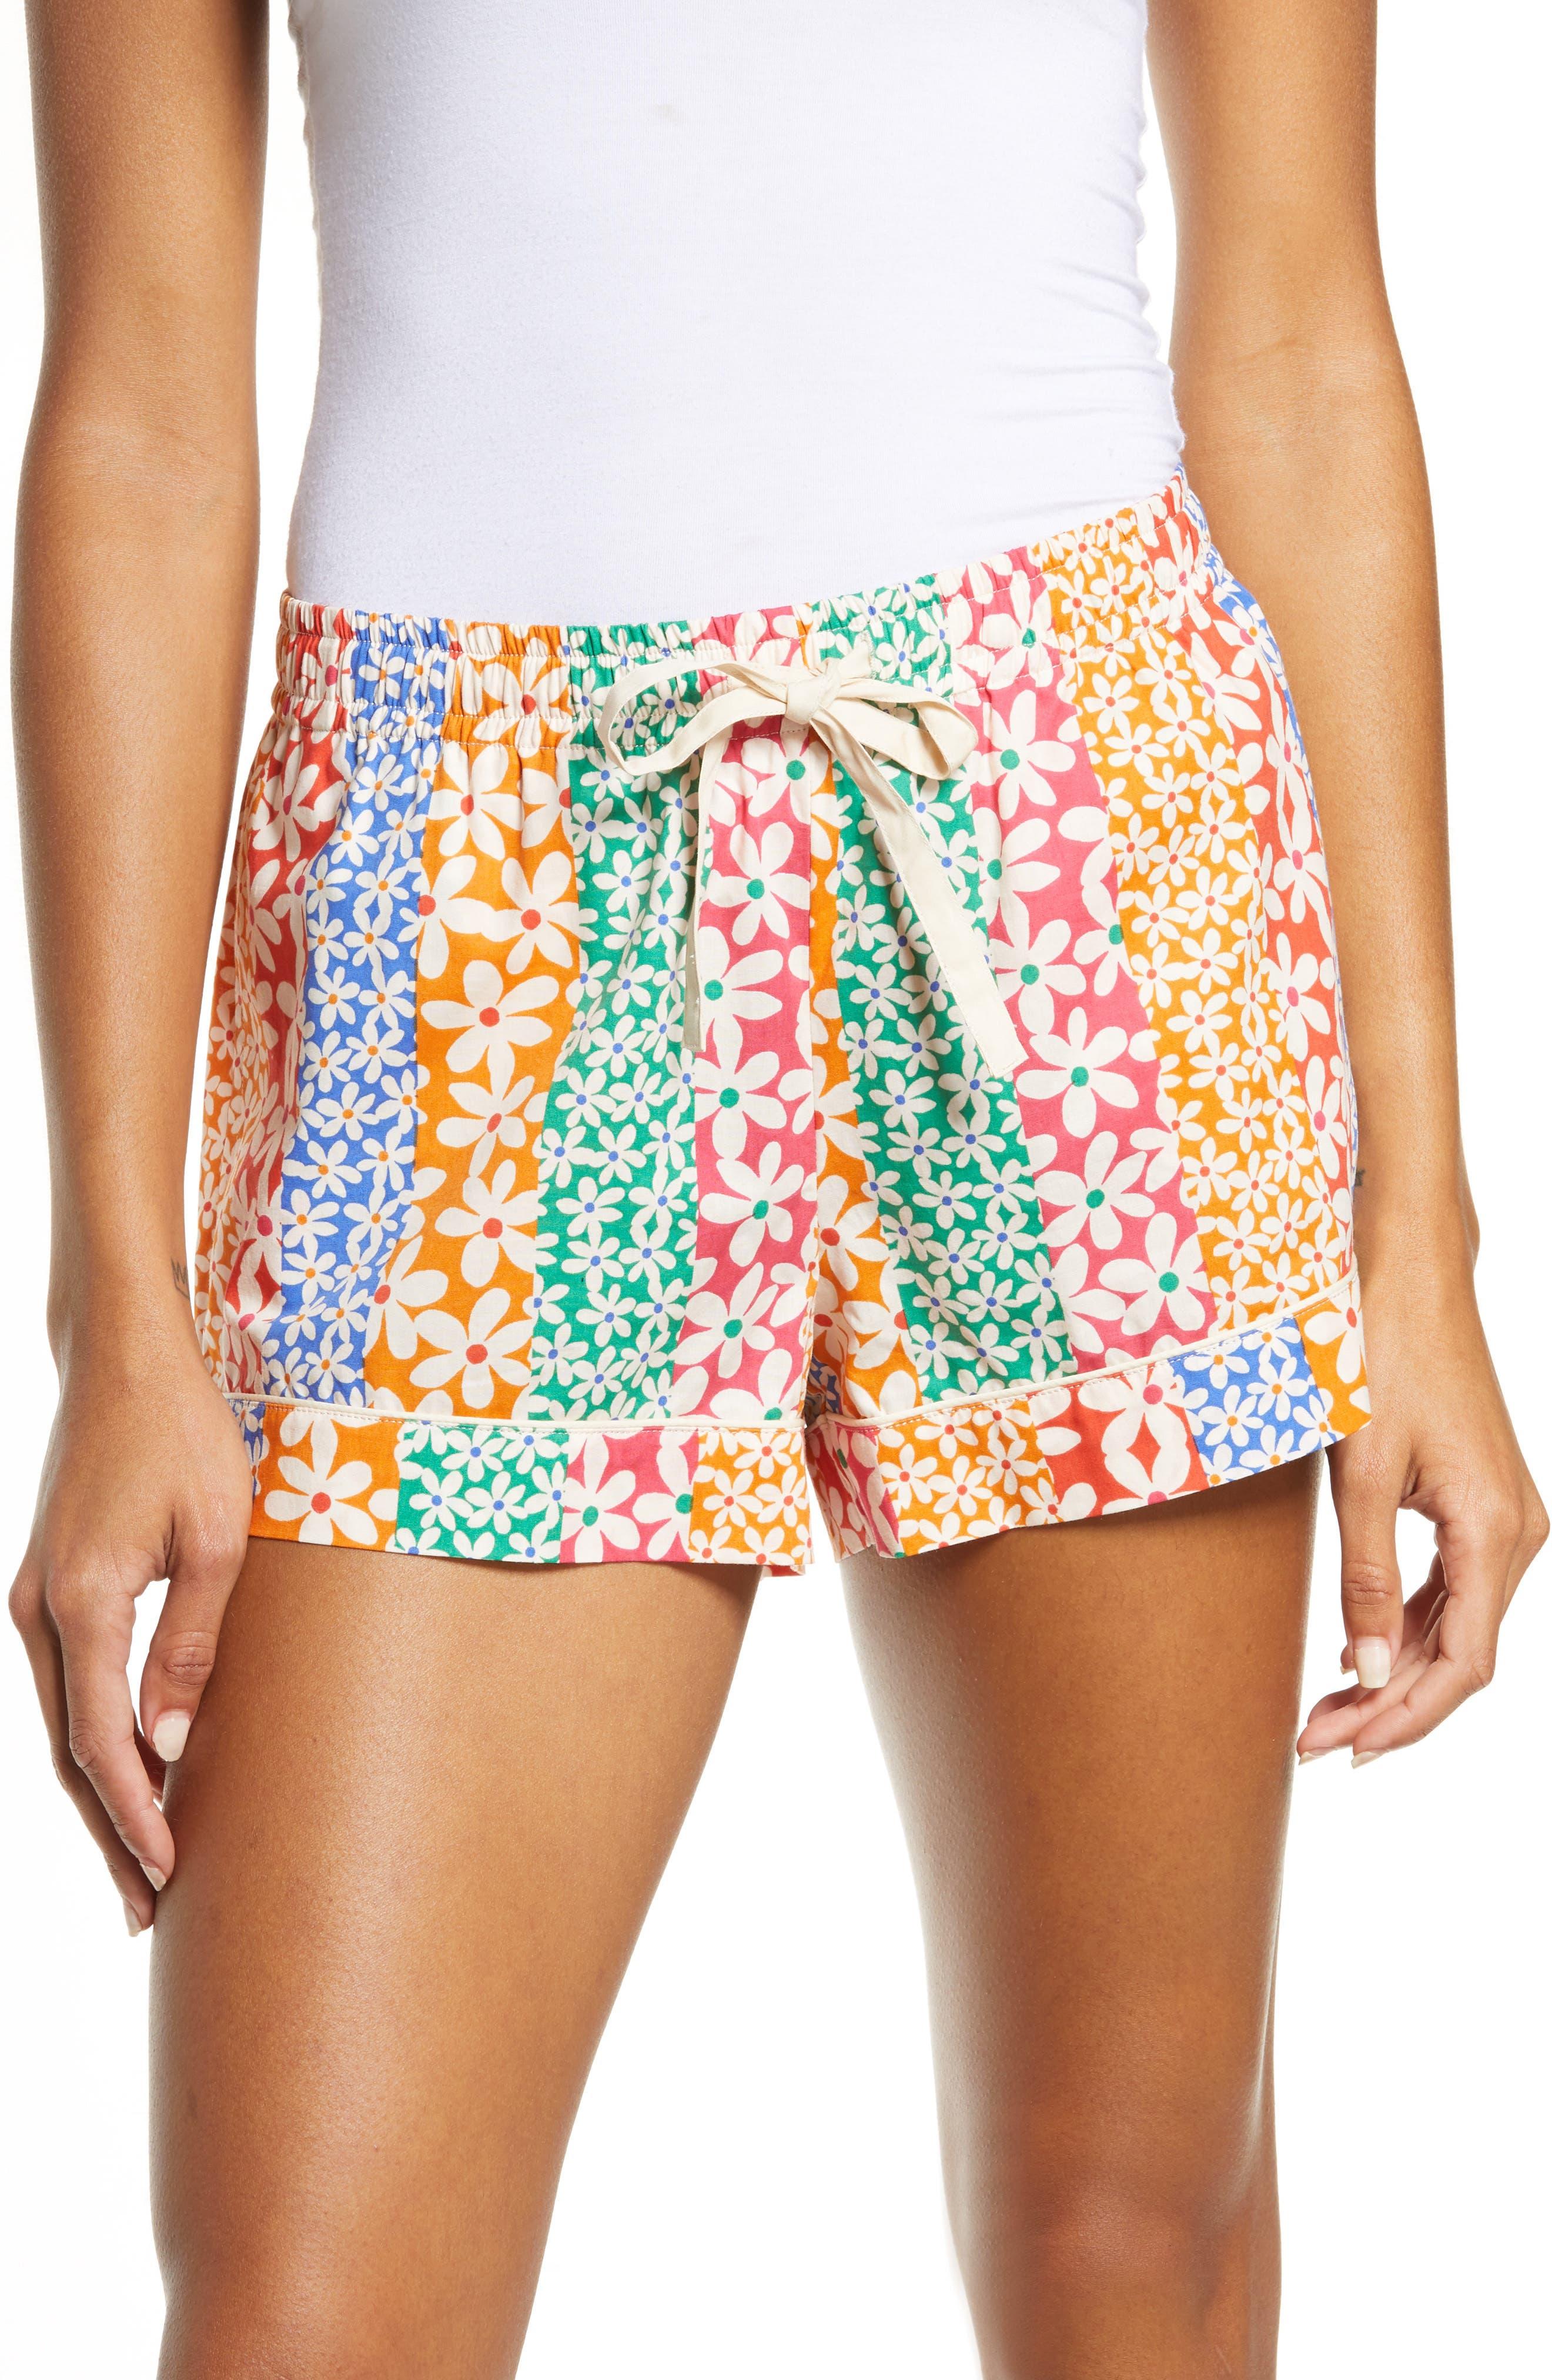 Women's Ban. do Floral Print Leisure Shorts